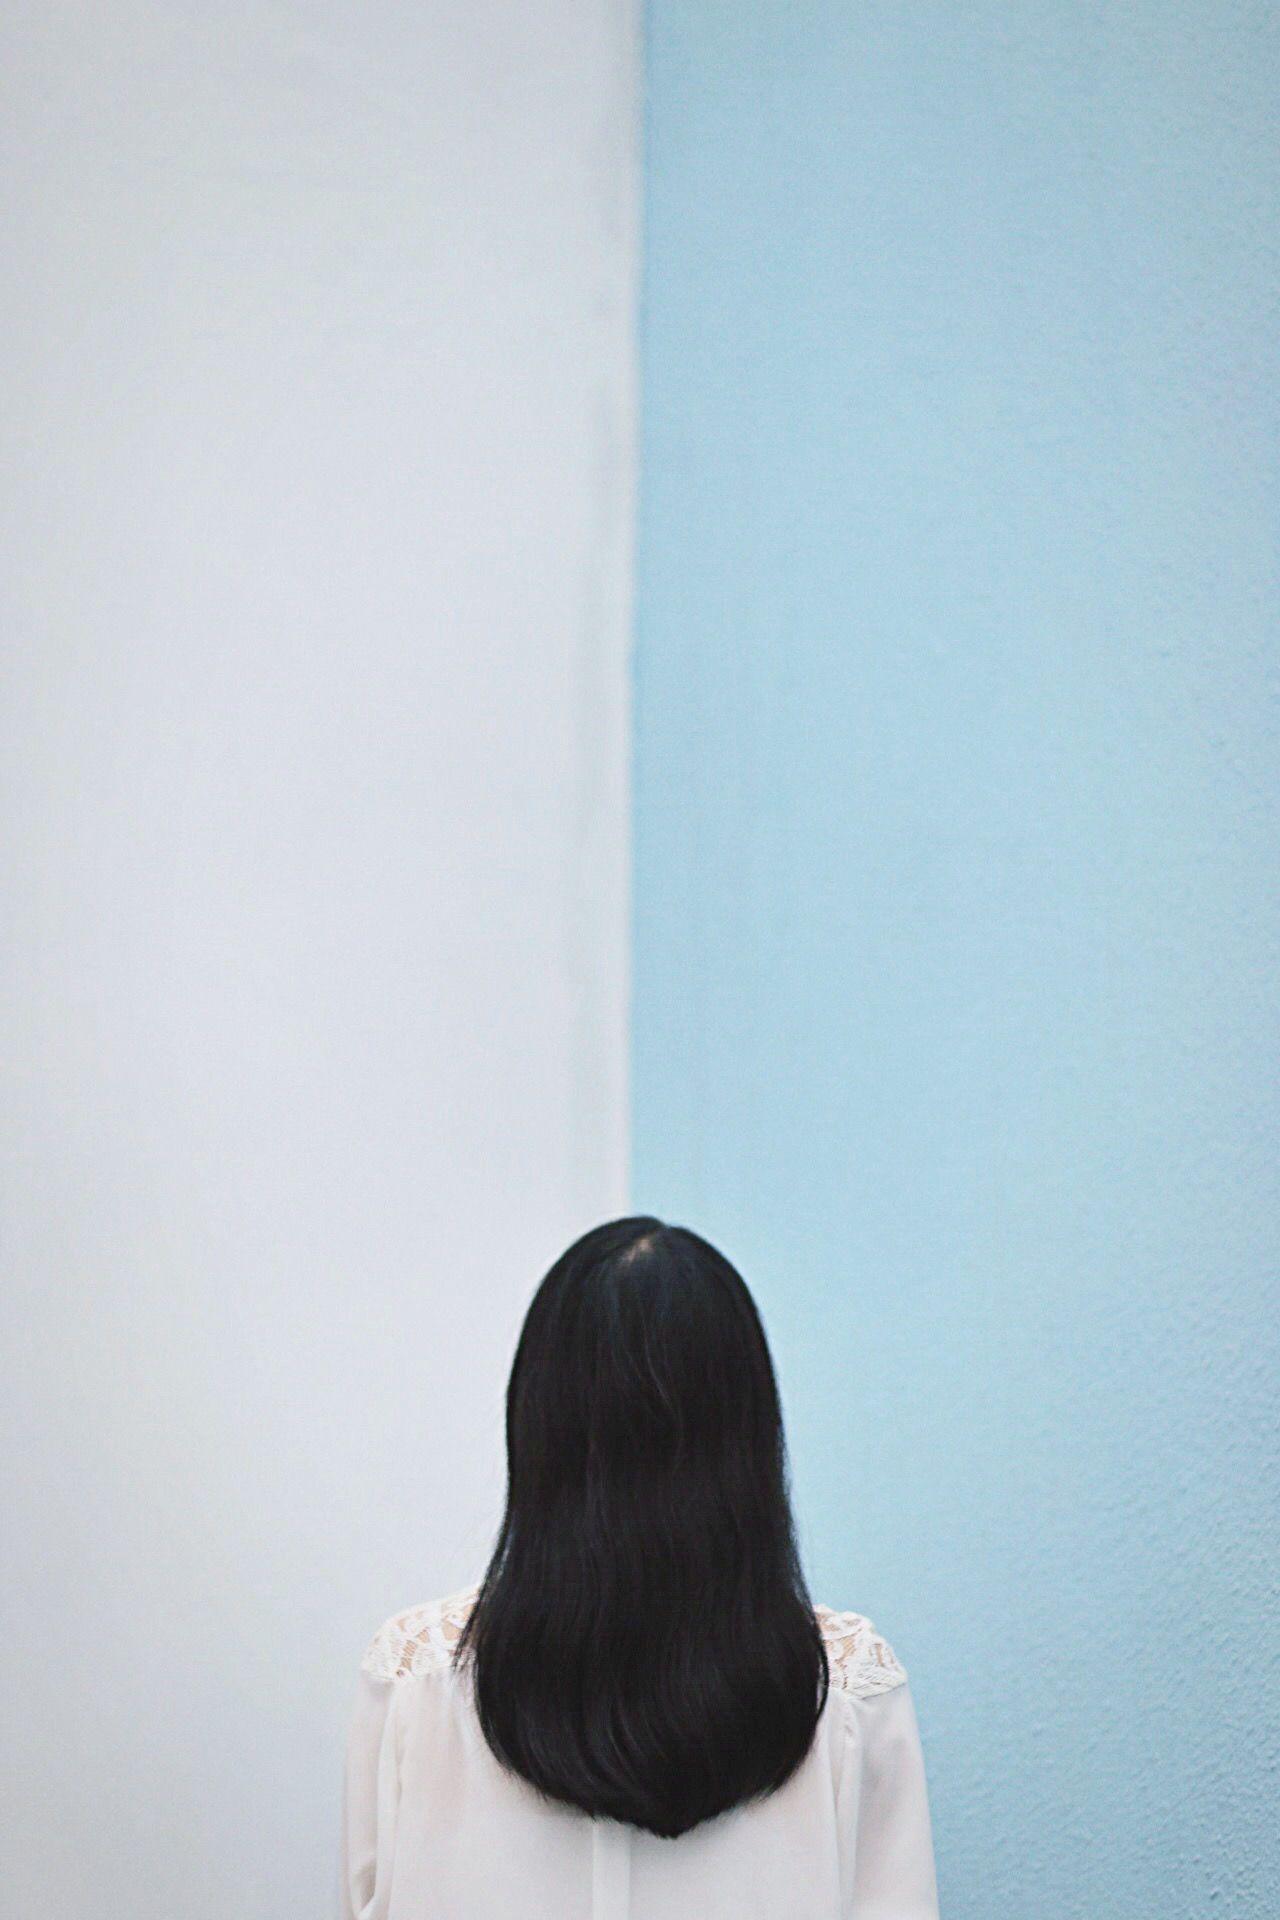 Blue, Copy Space, Headshot, Indoors, Lifestyles